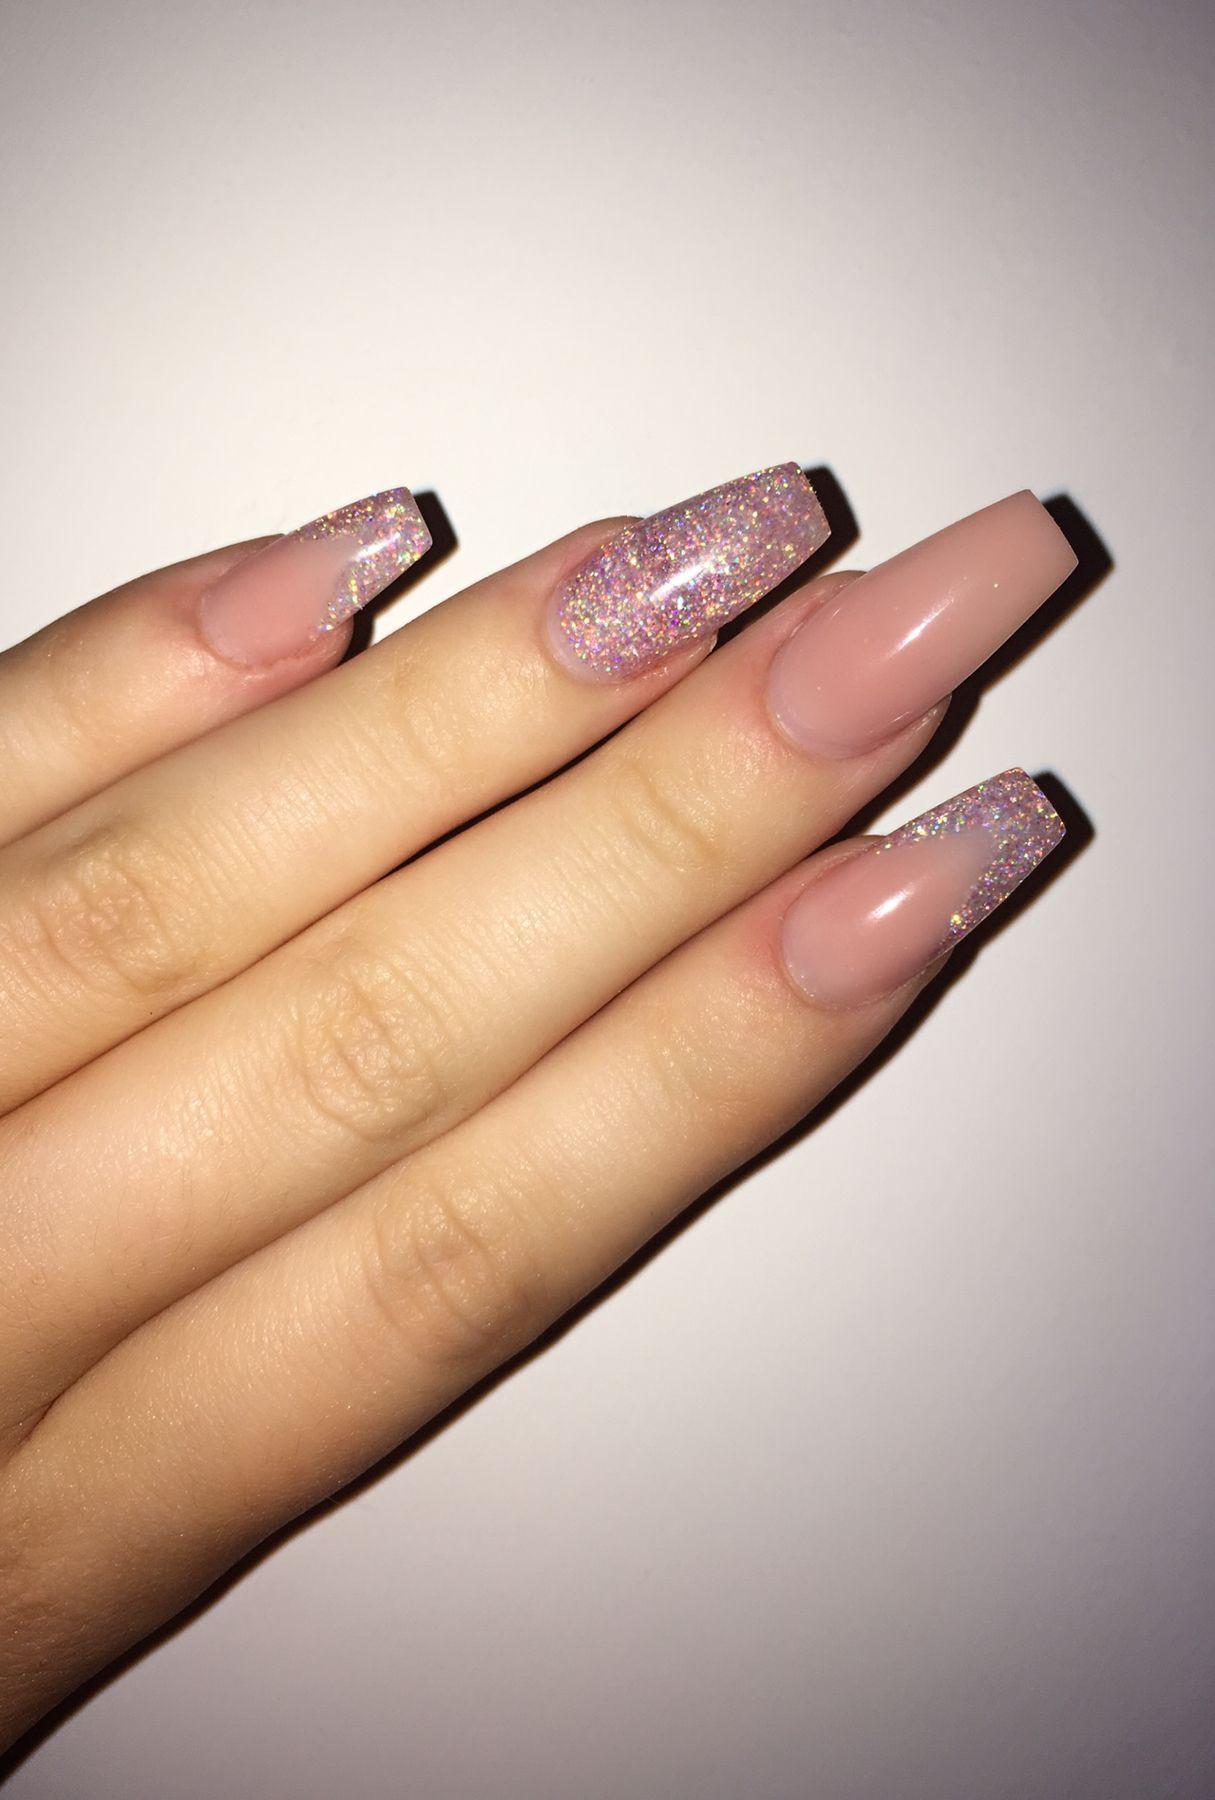 Nudes😍 #nails #nudes #nailinspo #nailgoals #nailideas - Metarnews Sites